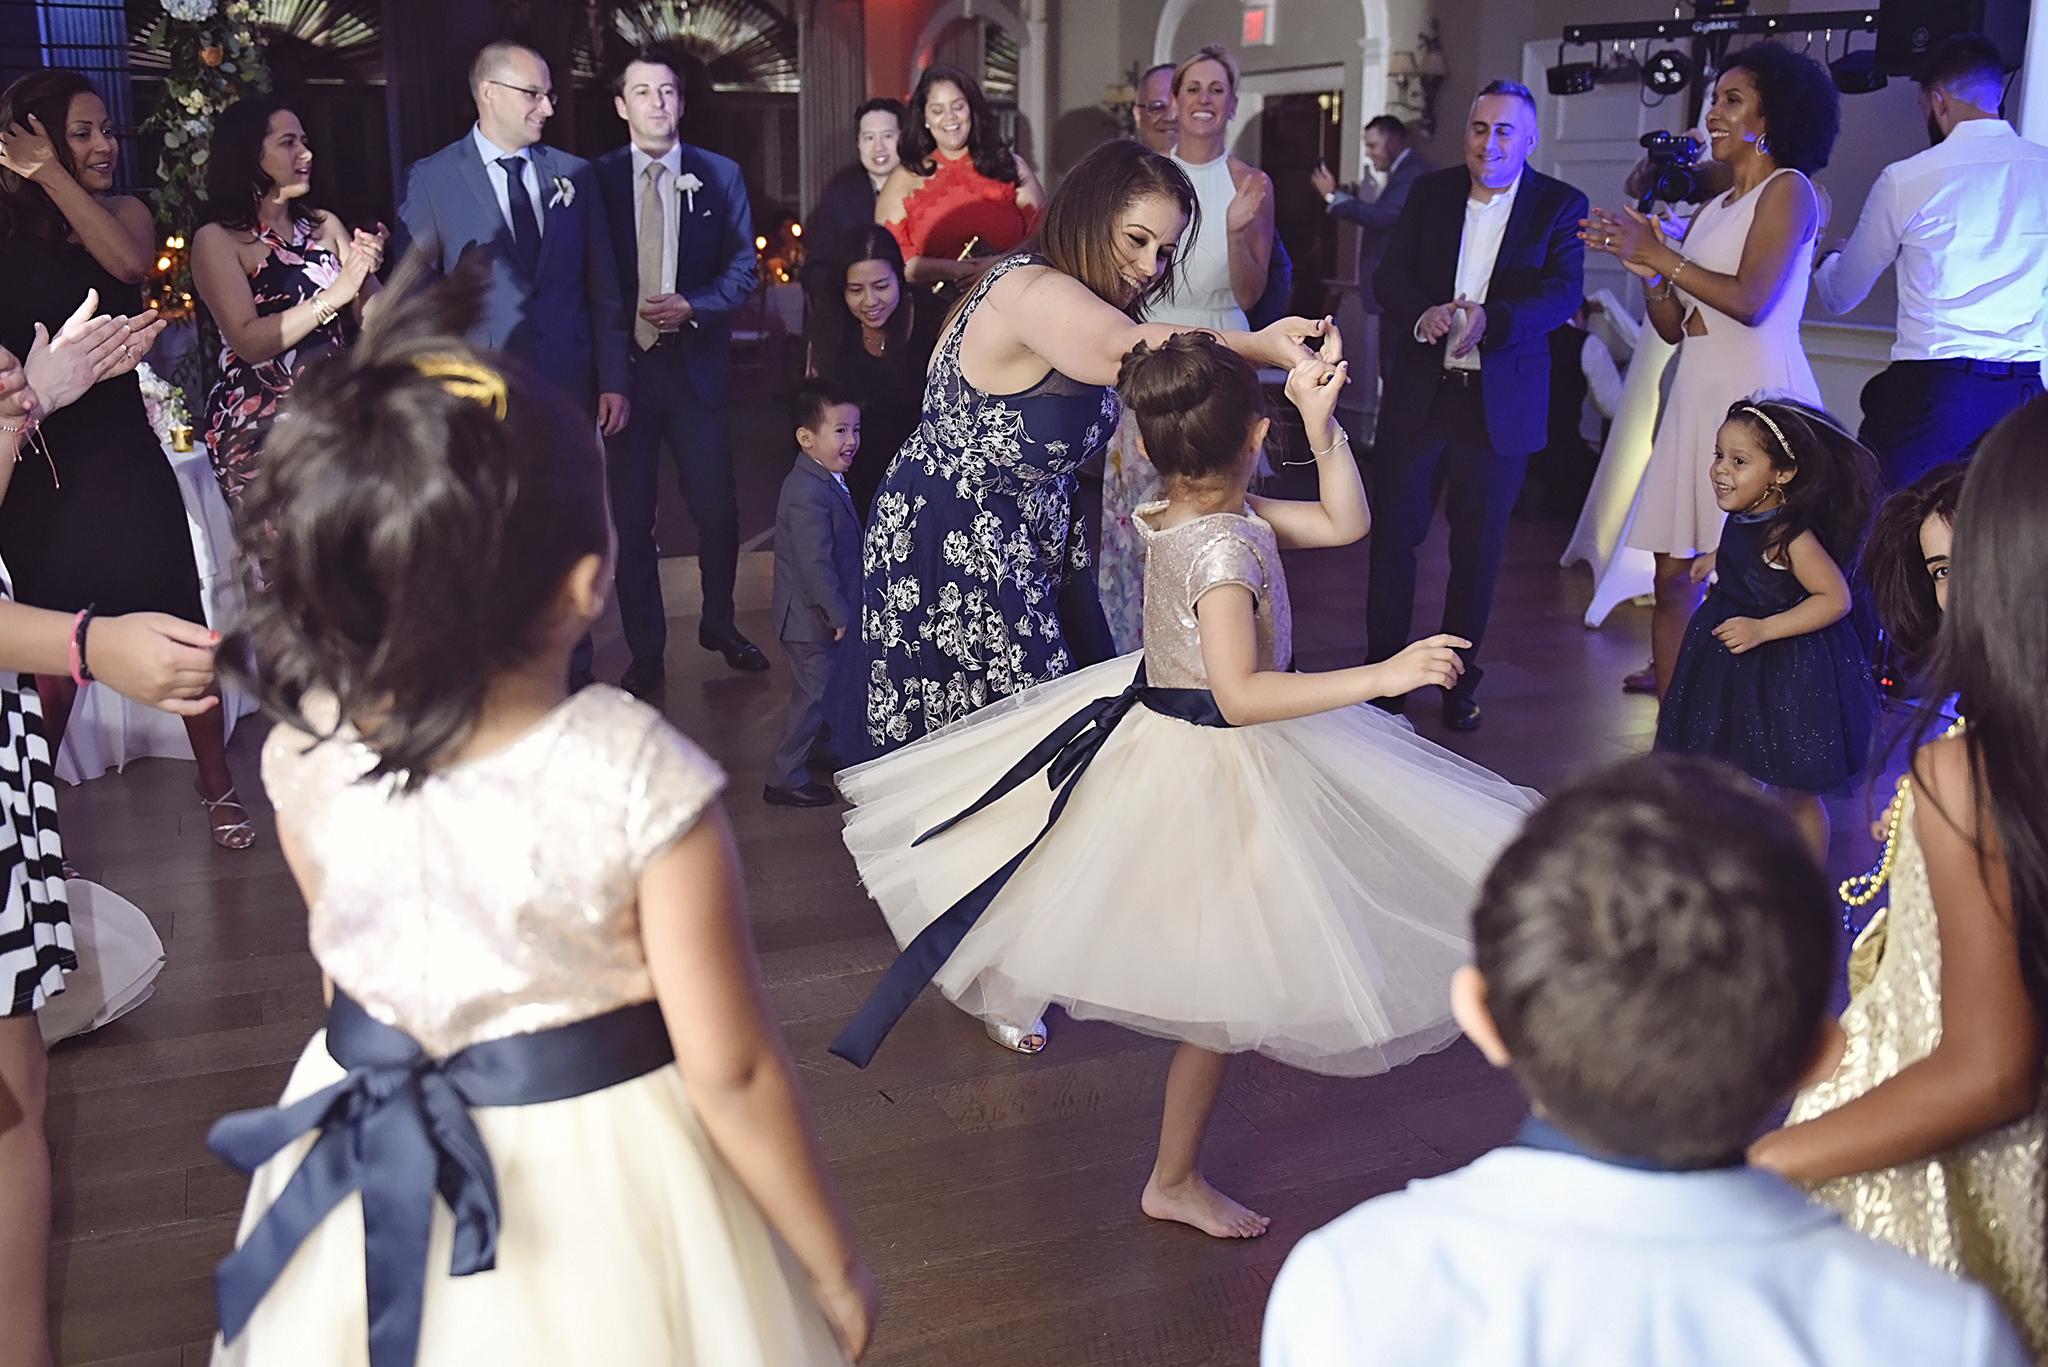 NJ-NY-wedding-photographer-162NJ-NY-wedding-photographer-162NJ-NY-WEDDING-PHOTOGRAPHER-162.JPG